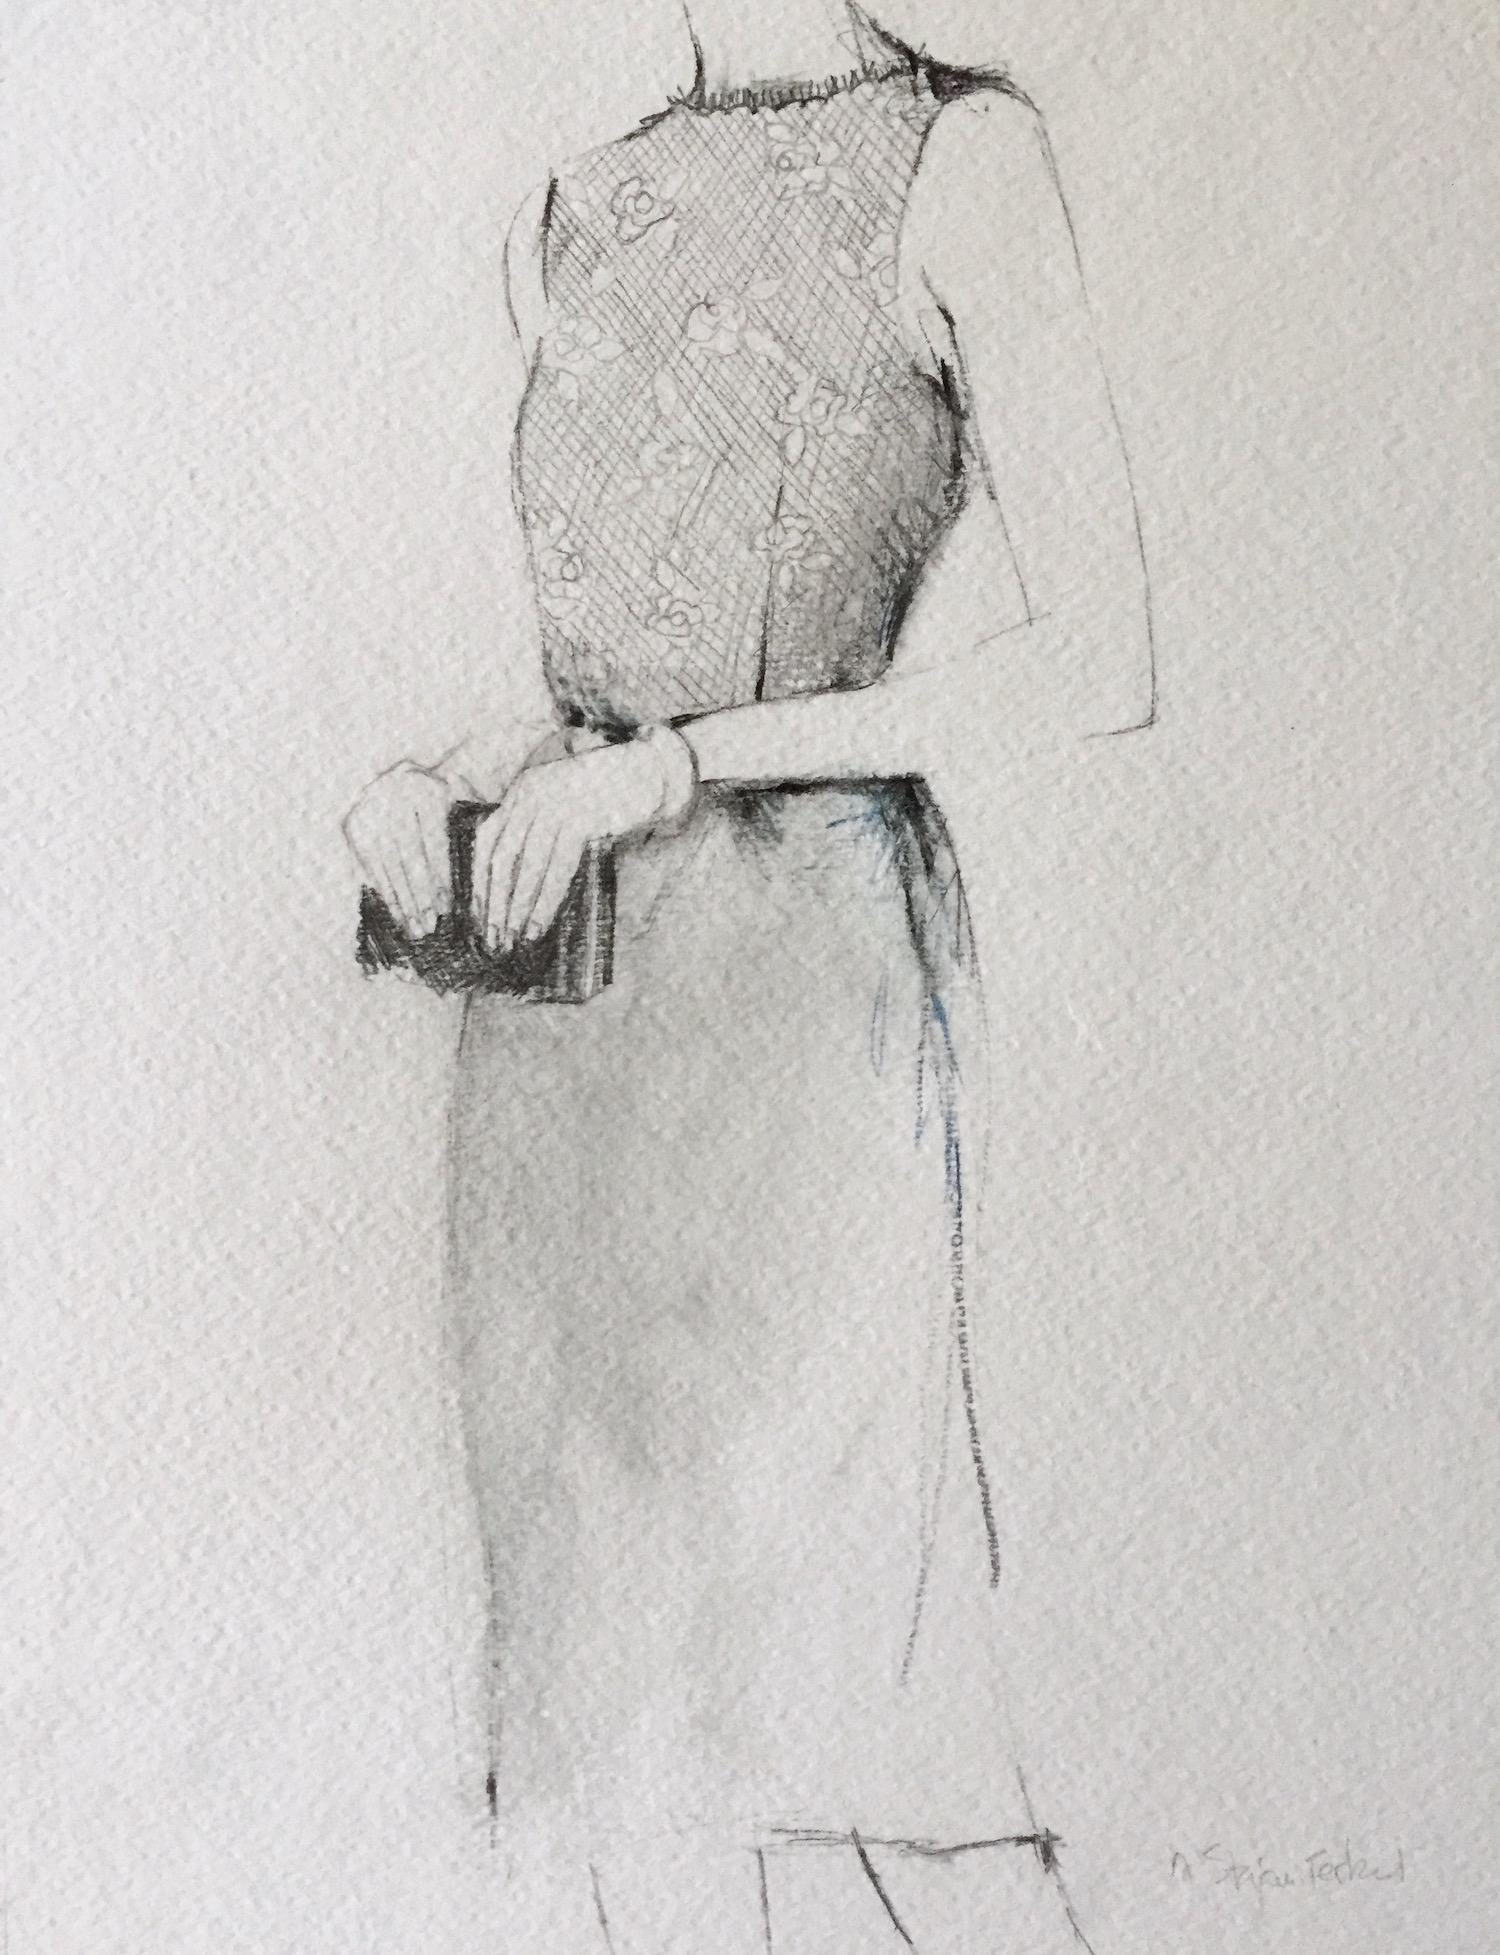 Bag Lady #4